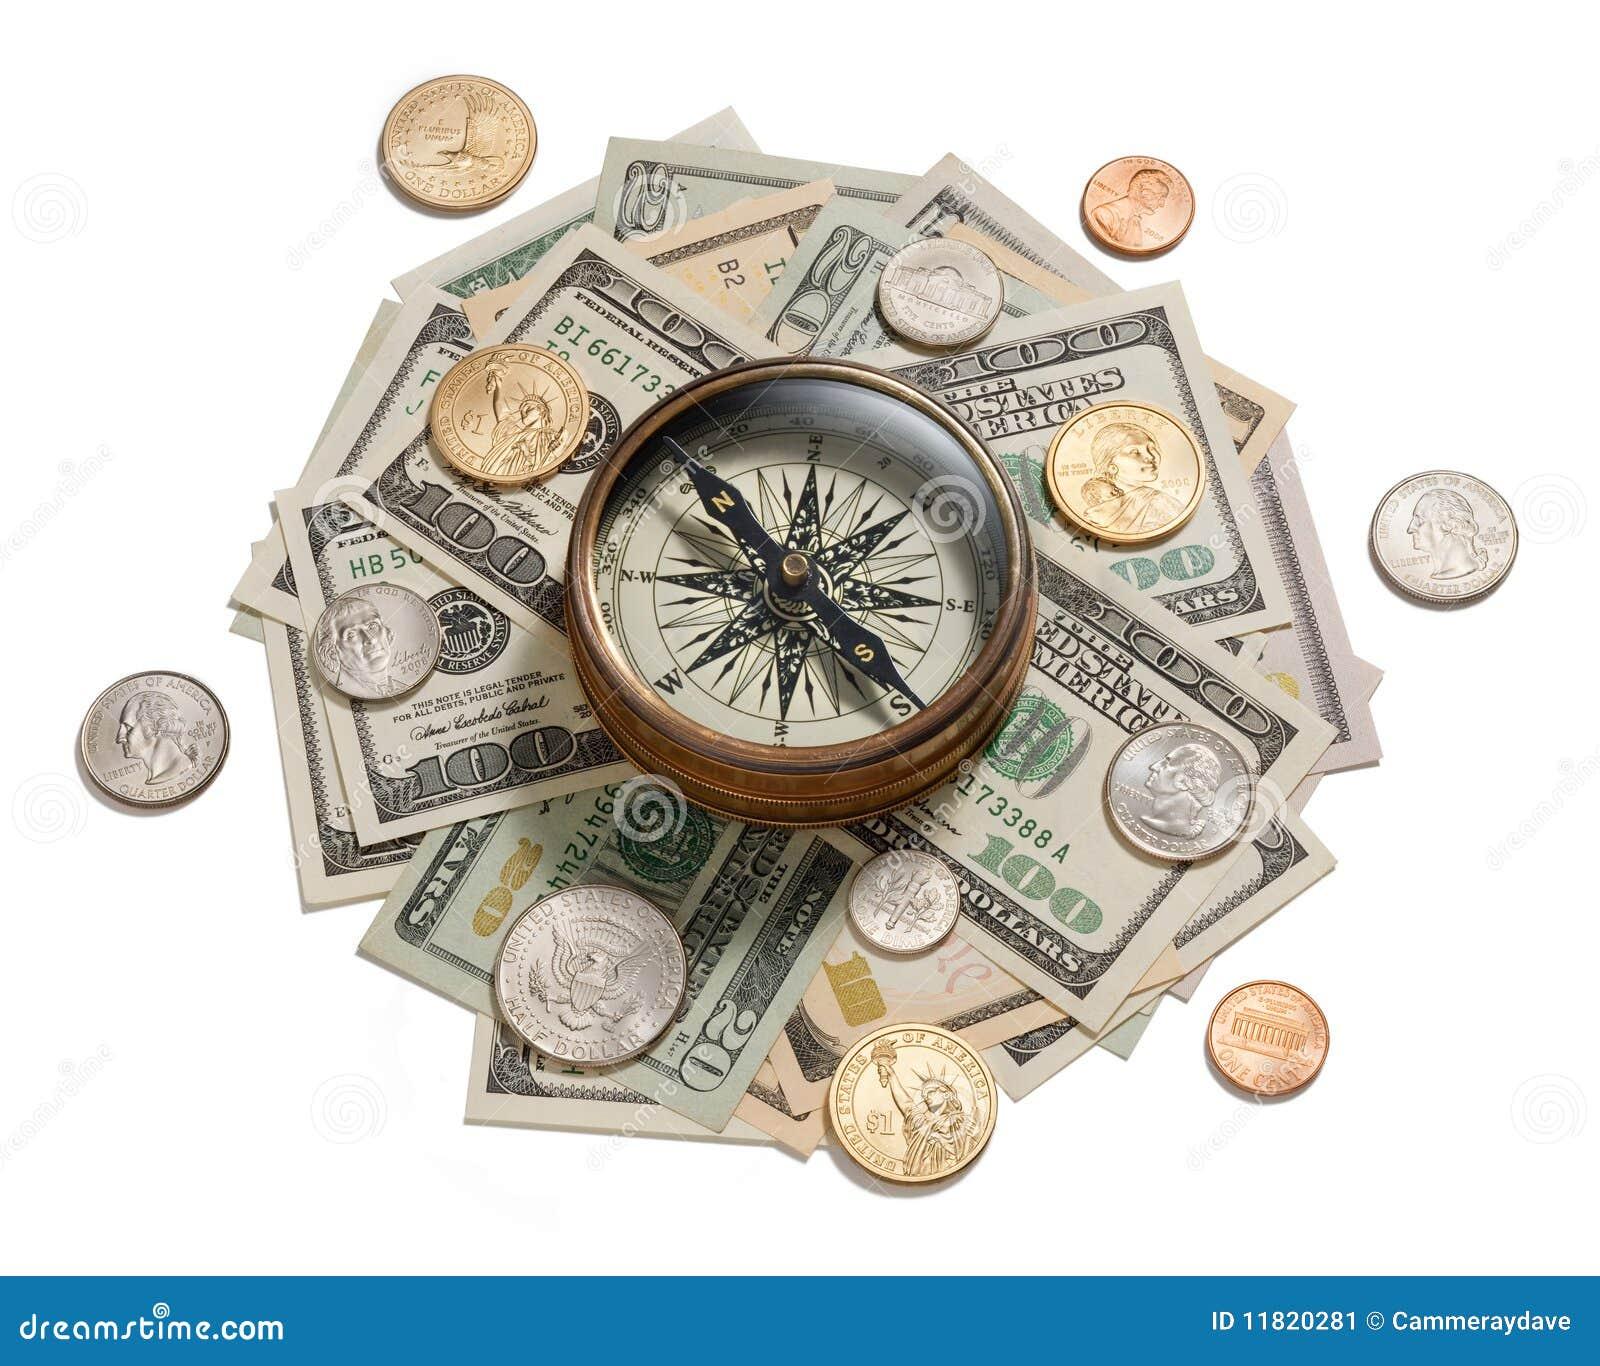 Het Amerikaanse Kompas van het Beheer van het Geld